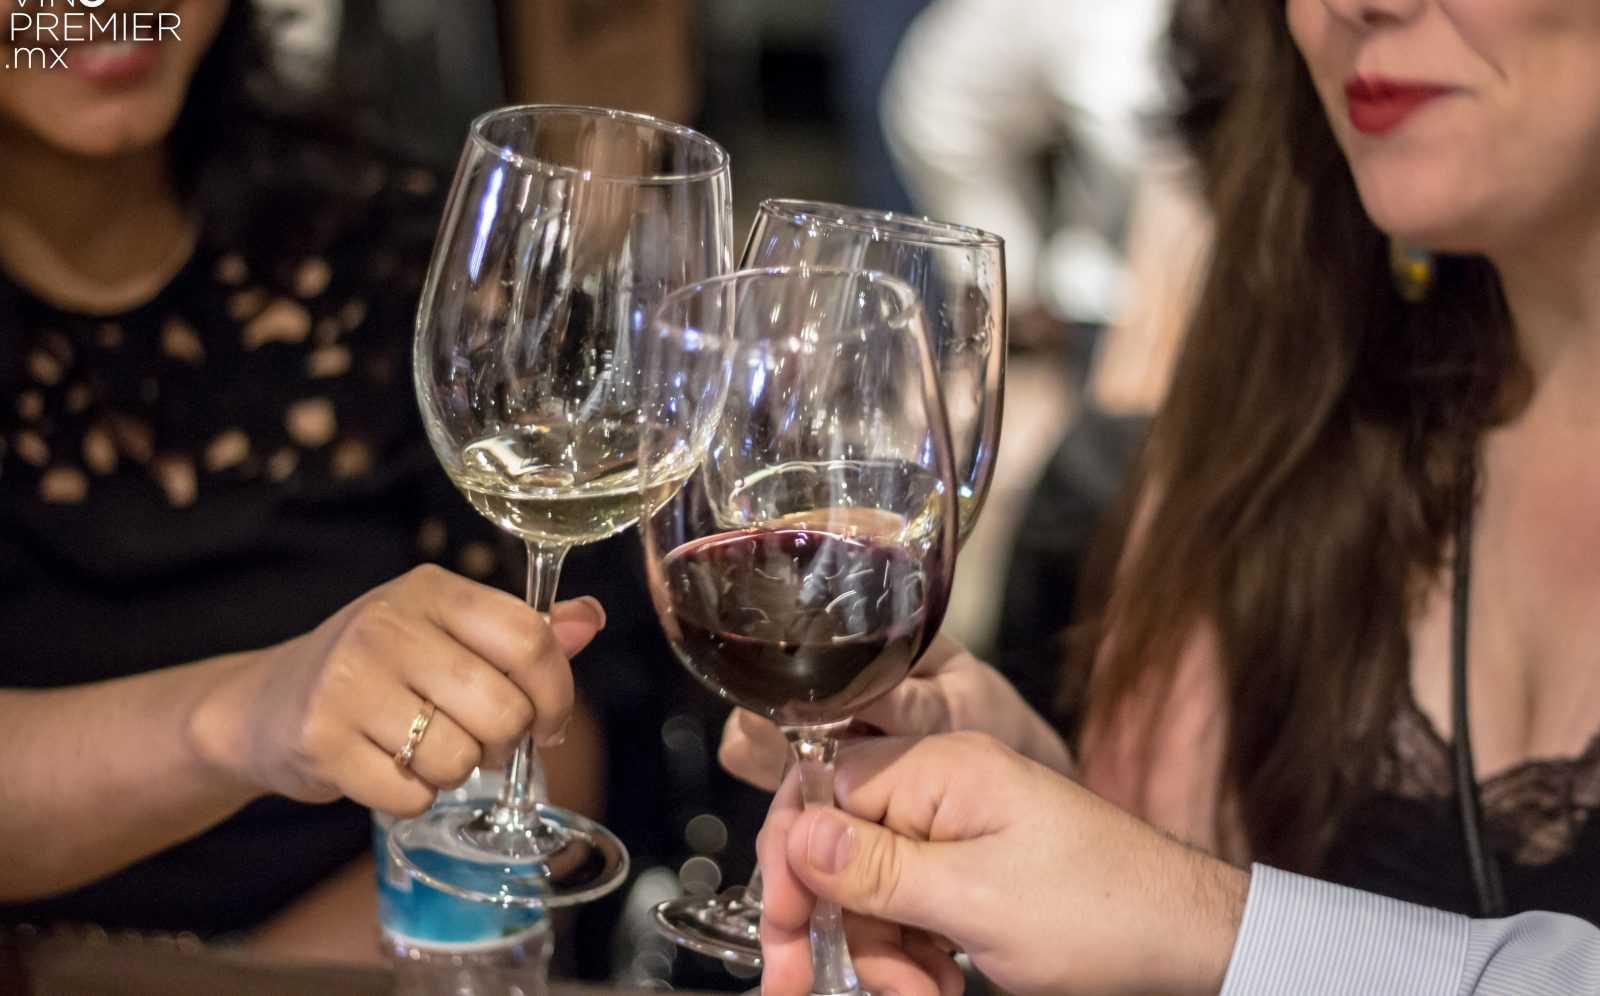 vinopremier condesa